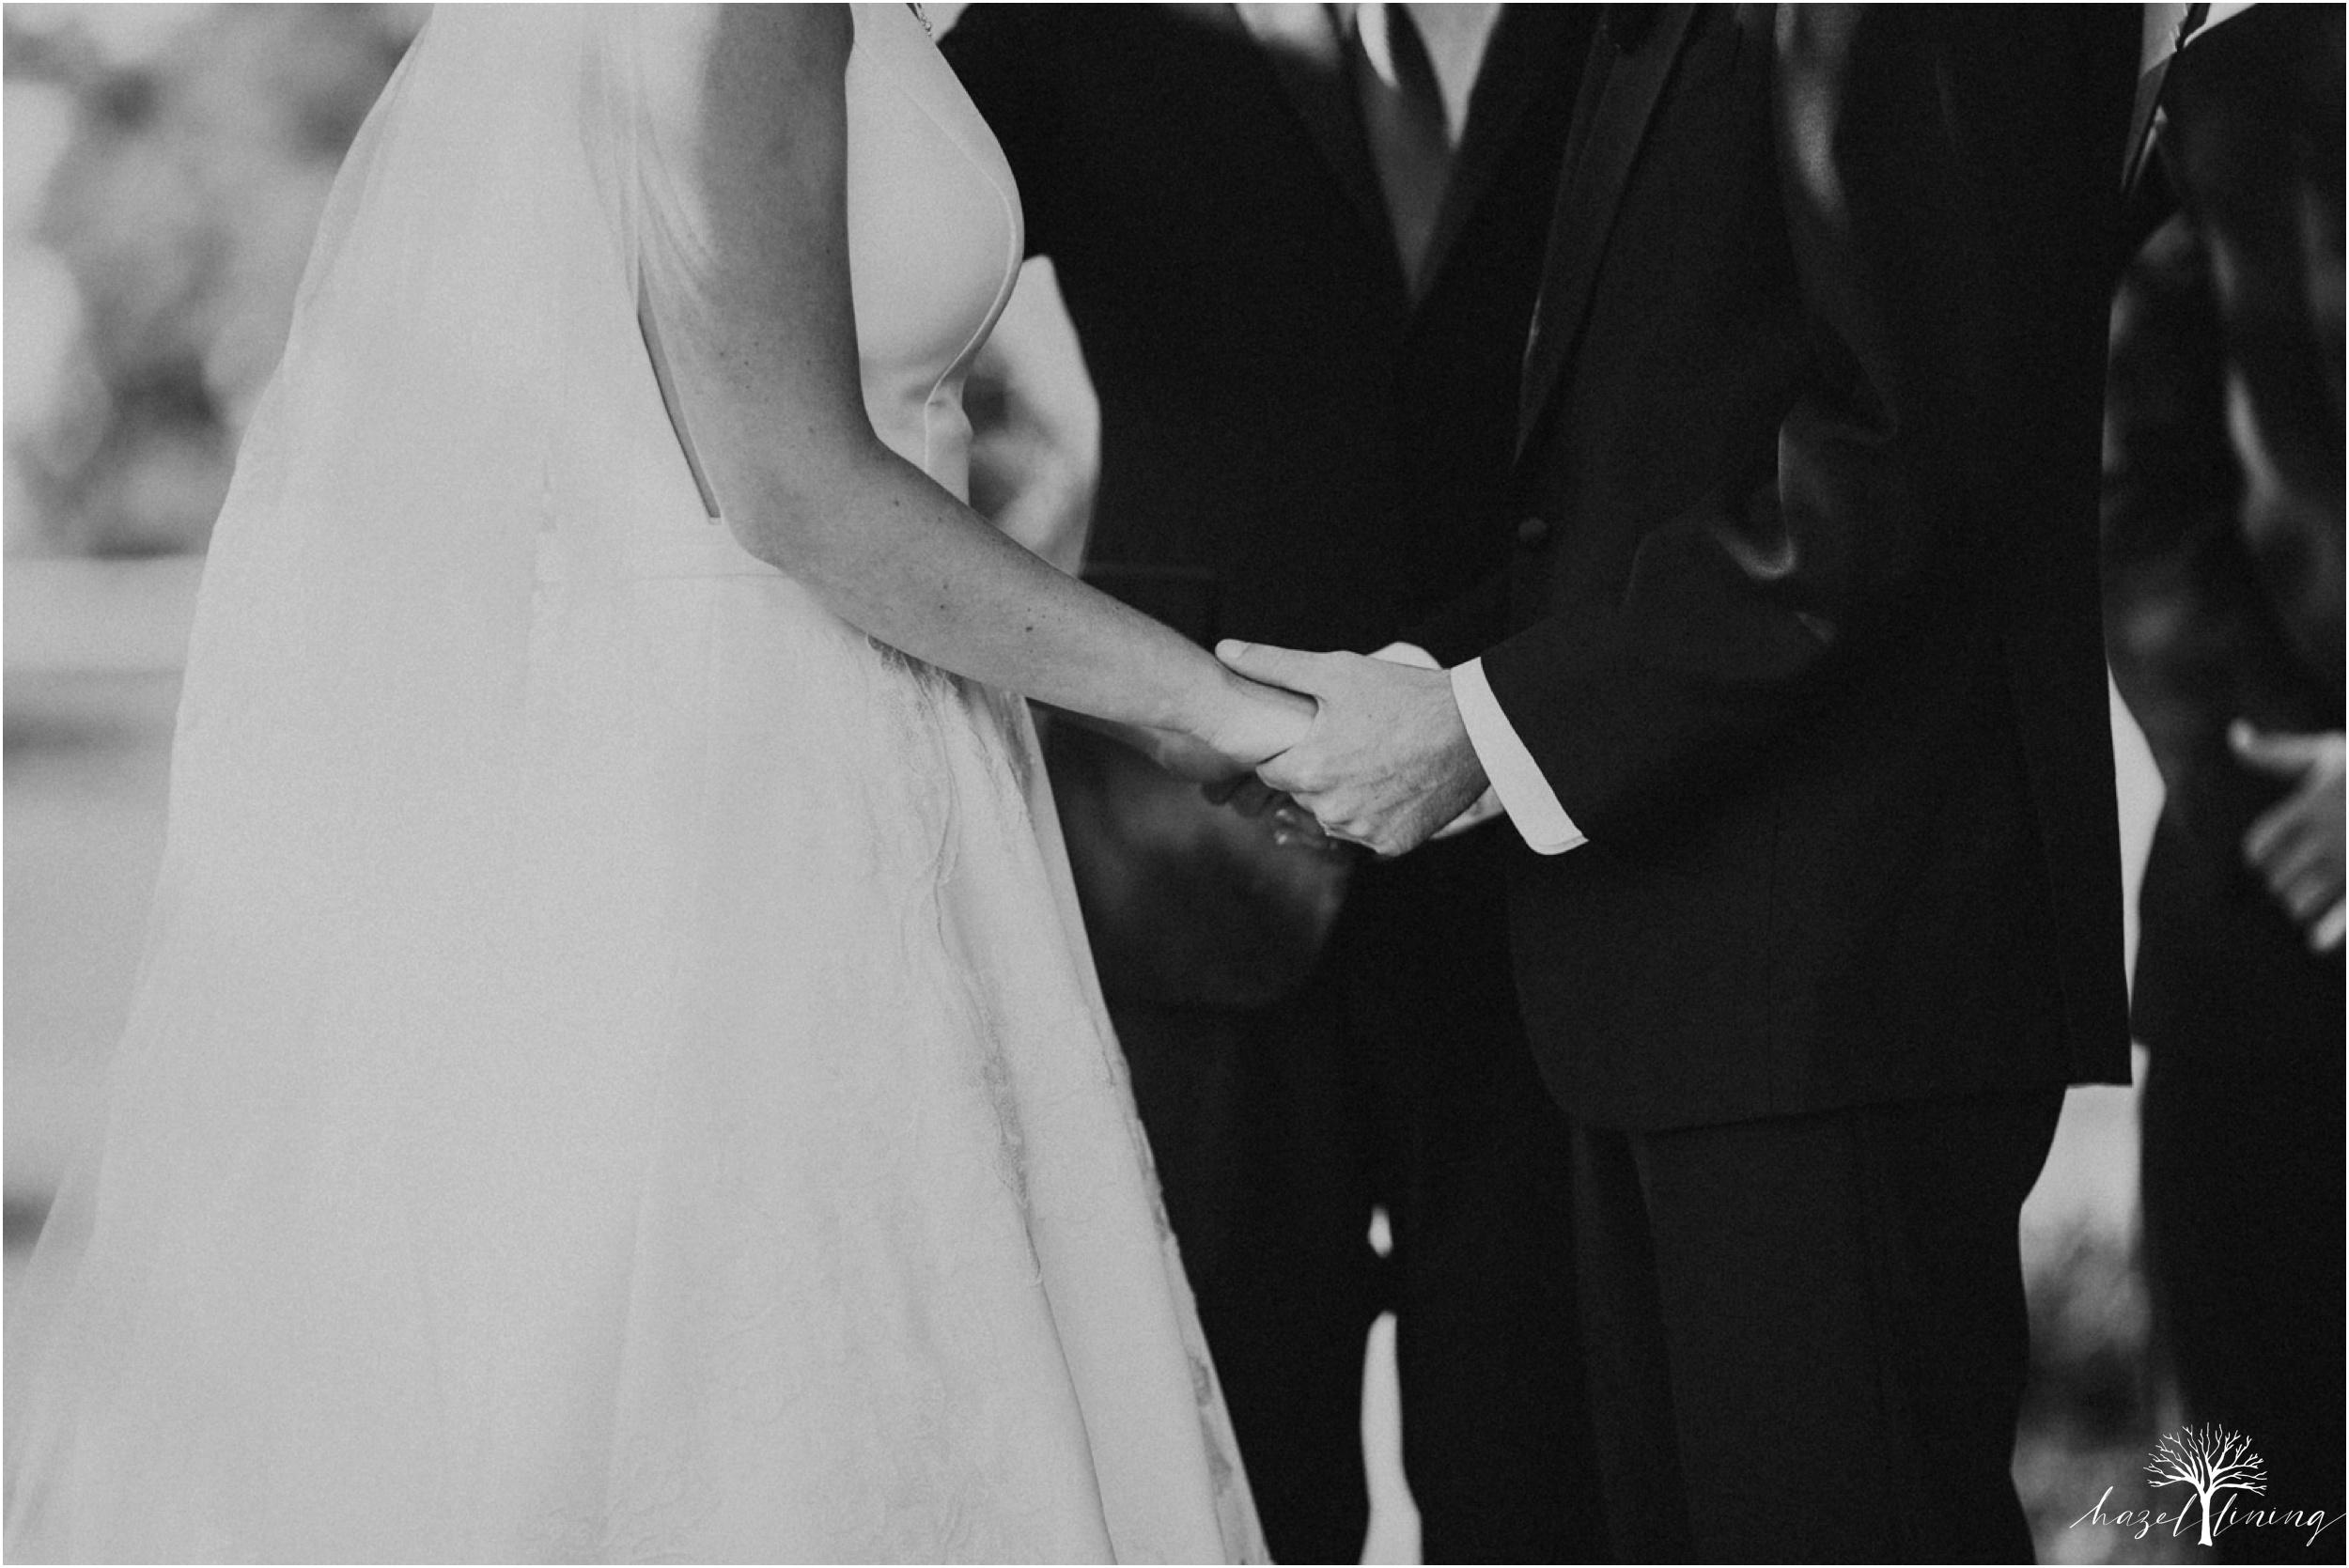 maureen-hepner-anthony-giordano-rose-bank-winery-newtow-pennsylvania-luxury-summer-wedding-hazel-lining-photography-destination-elopement-wedding-engagement-photography_0072.jpg